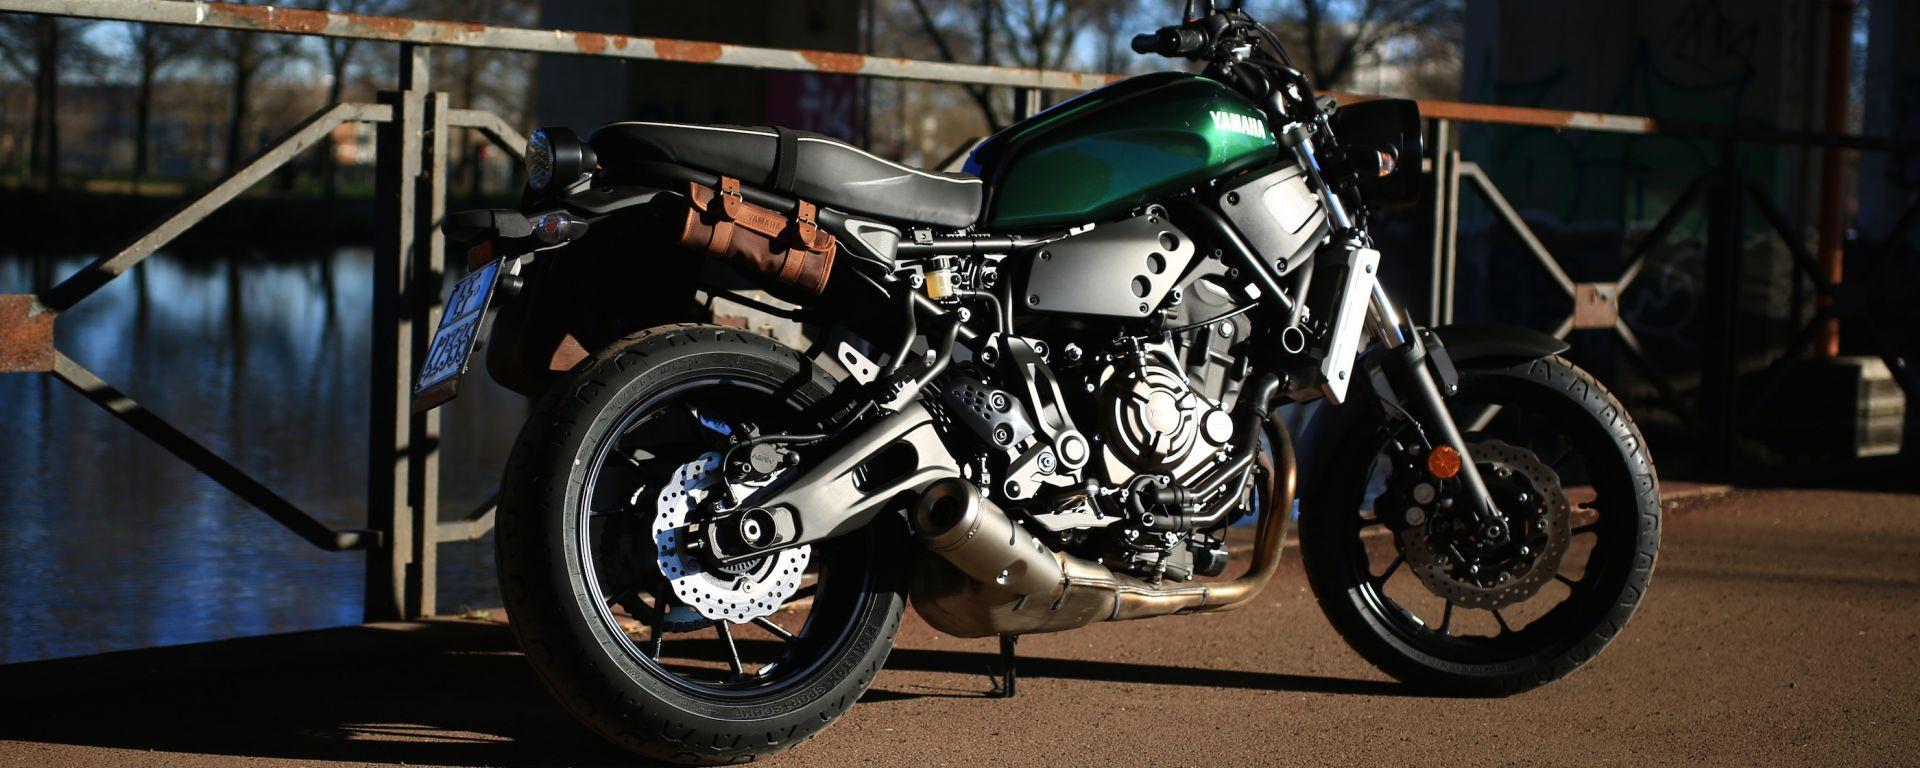 Yamaha XSR700: giorno 5